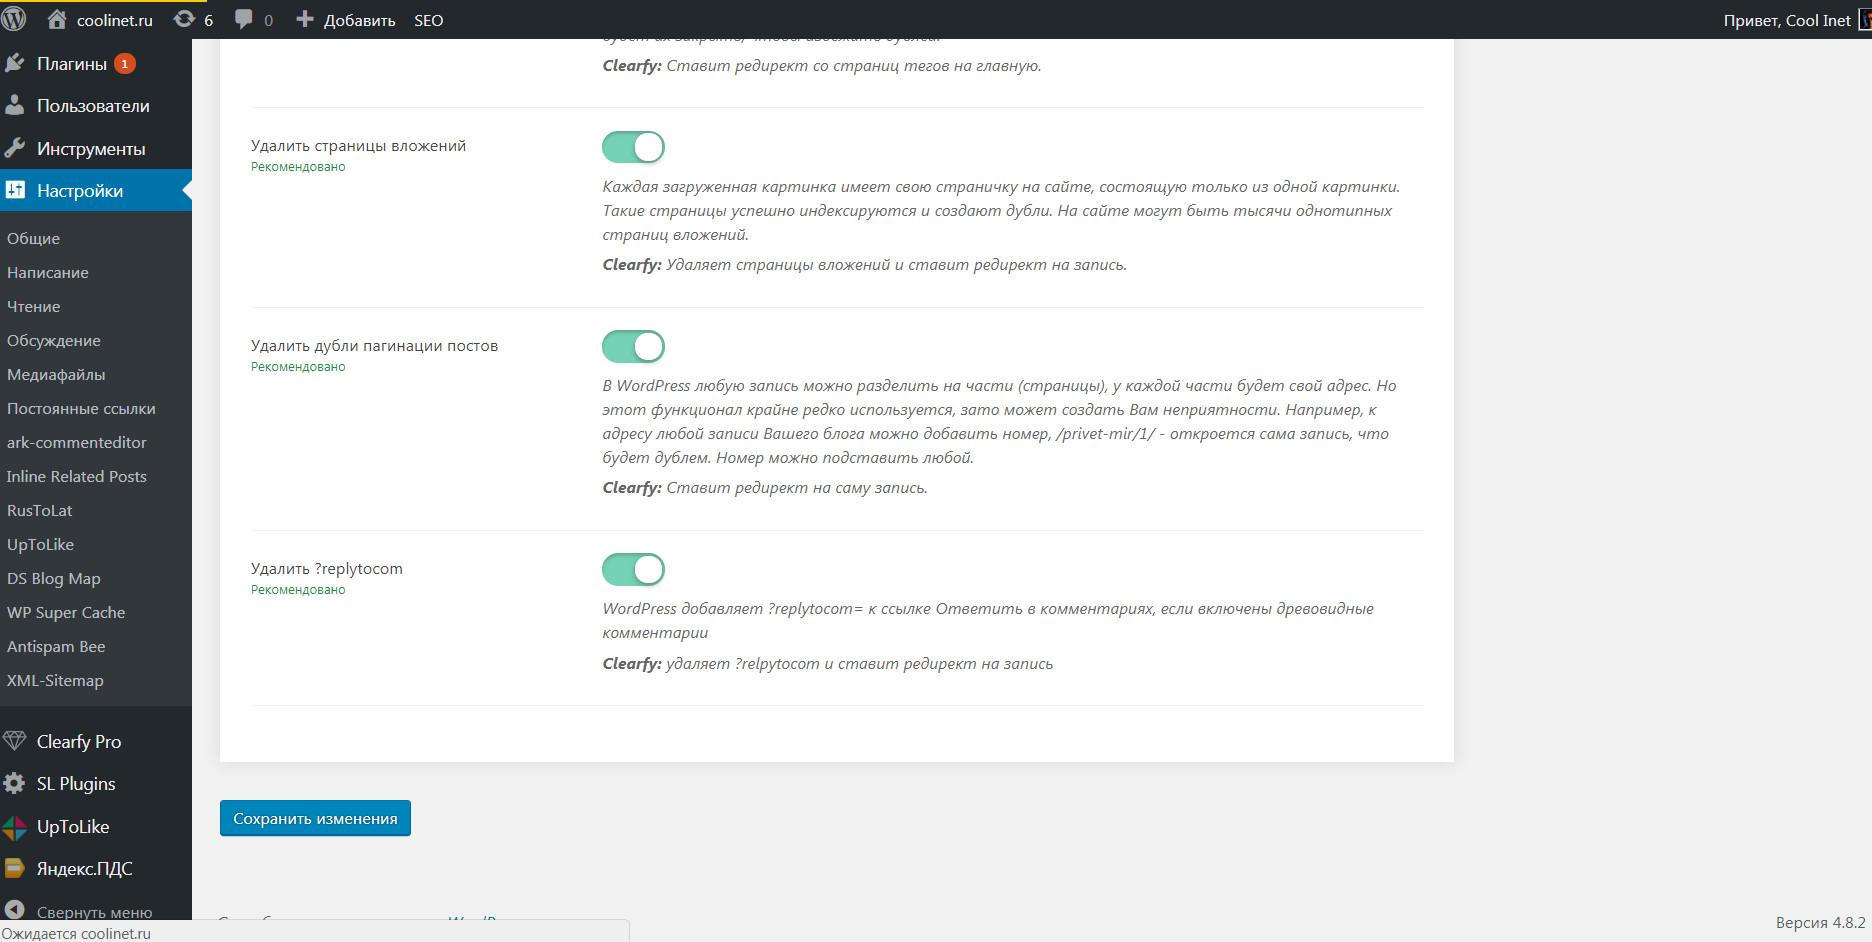 Clearfy Pro - плагин оптимизации для WordPress, мой отзыв